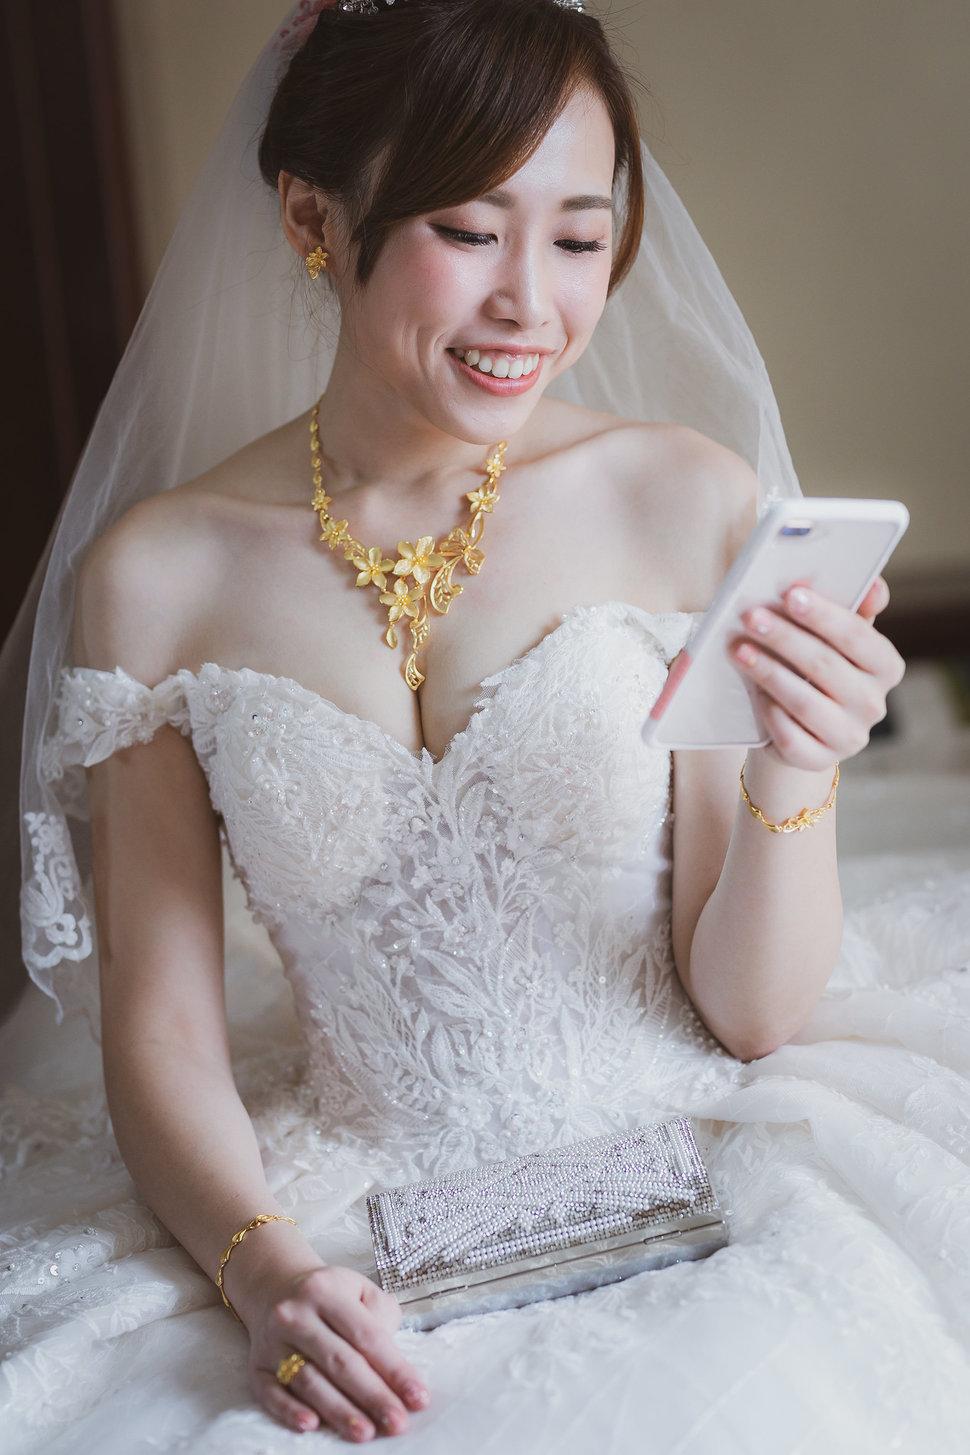 32864362747_a81ed11e80_k - J Photographer《結婚吧》